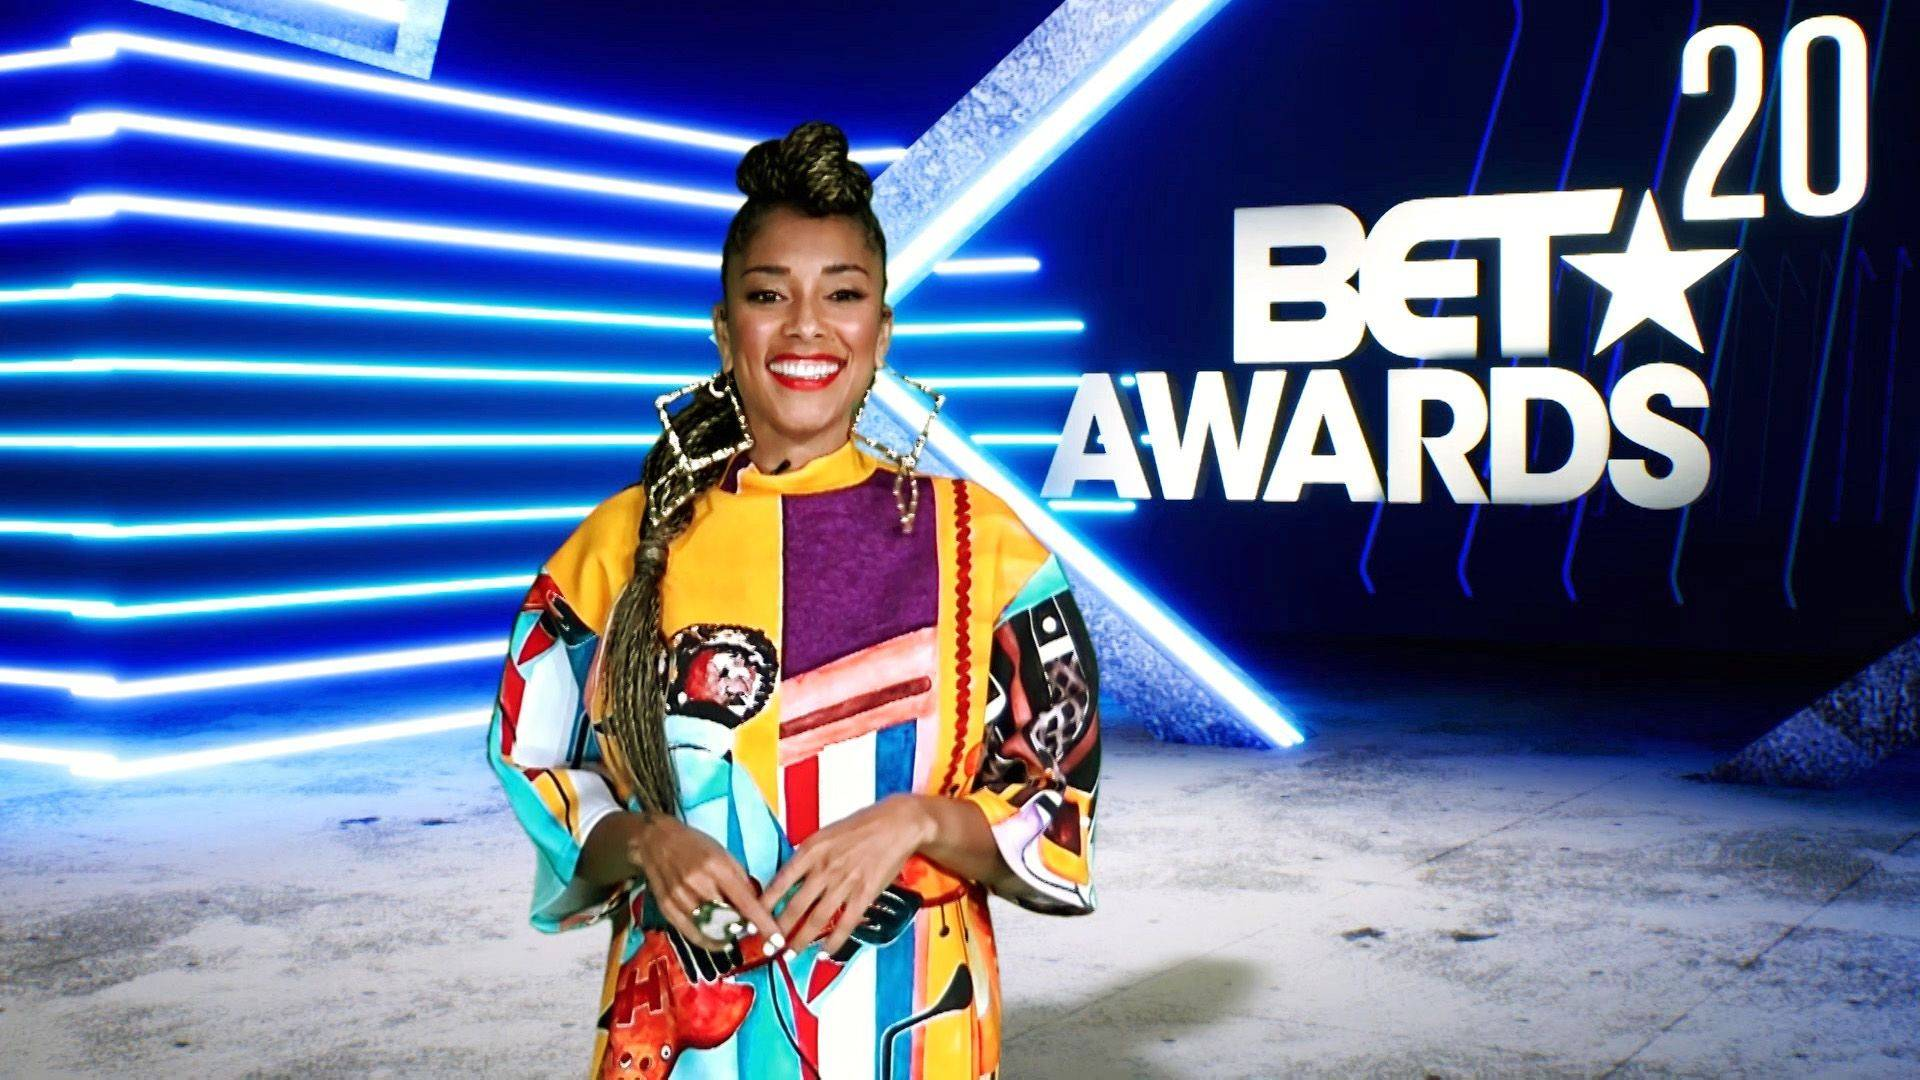 BET Awards 2020 | Host Looks Gallery 10 | 1920x1080